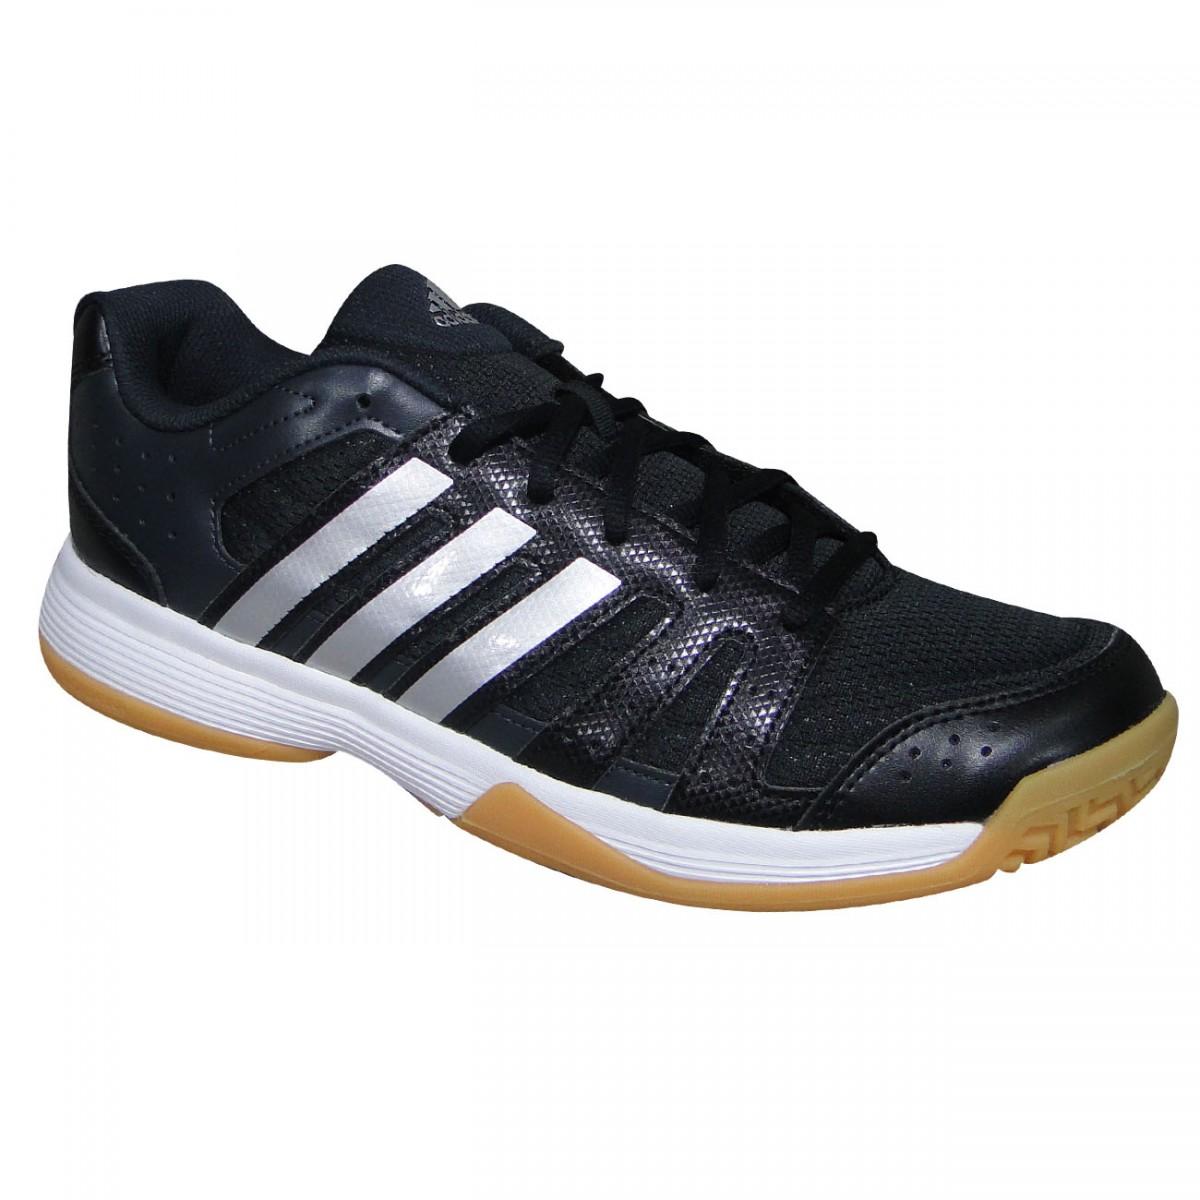 Tenis Adidas Ligra 3 B33042 - Preto Branco Cinza - Chuteira Nike ... 43a2bc6e1008d